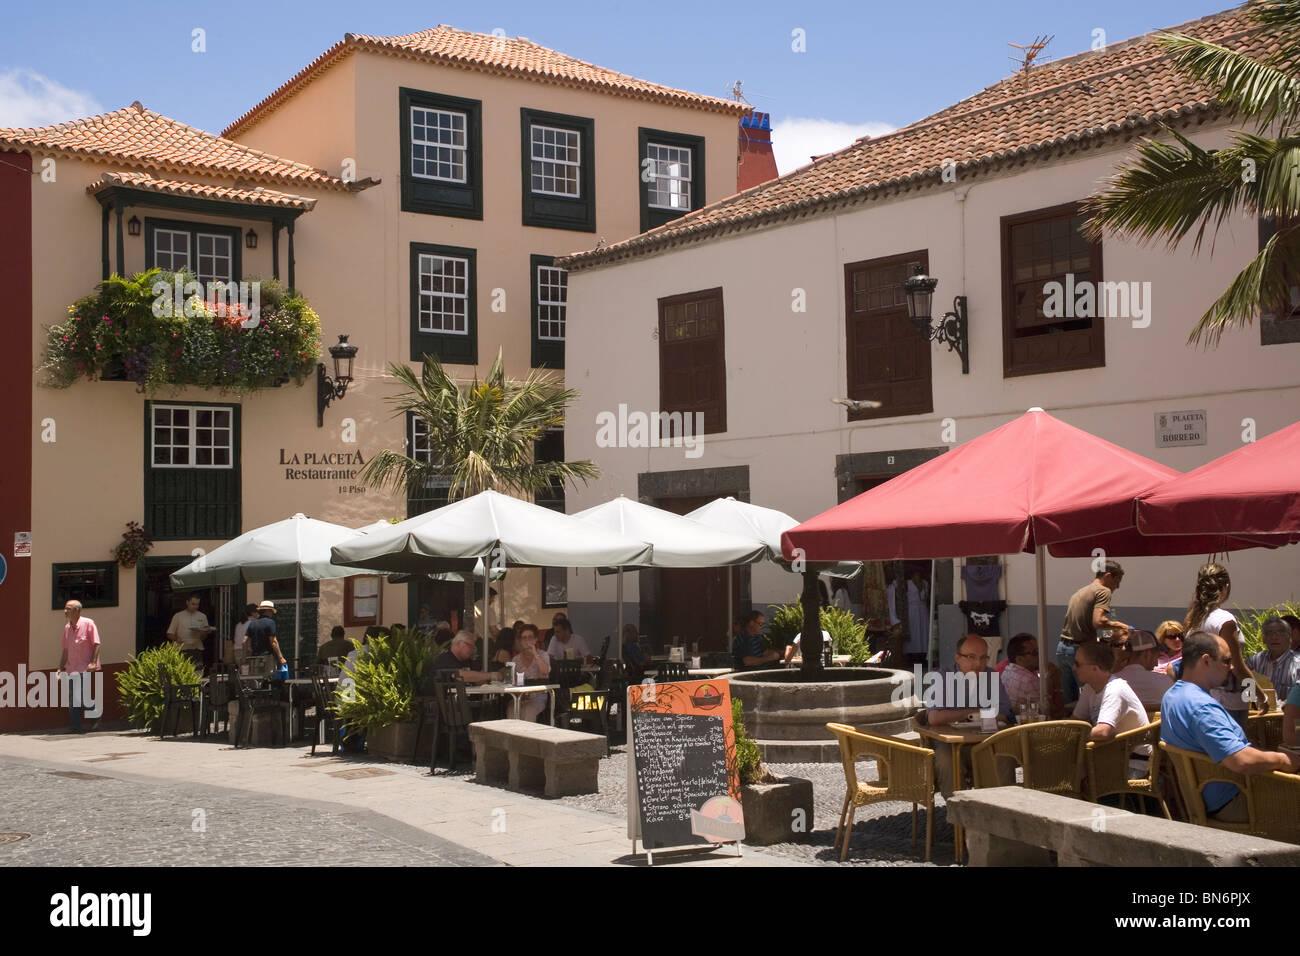 Spanien-Kanarische Inseln La Palma Santa Cruz Café in der Altstadt Stockbild